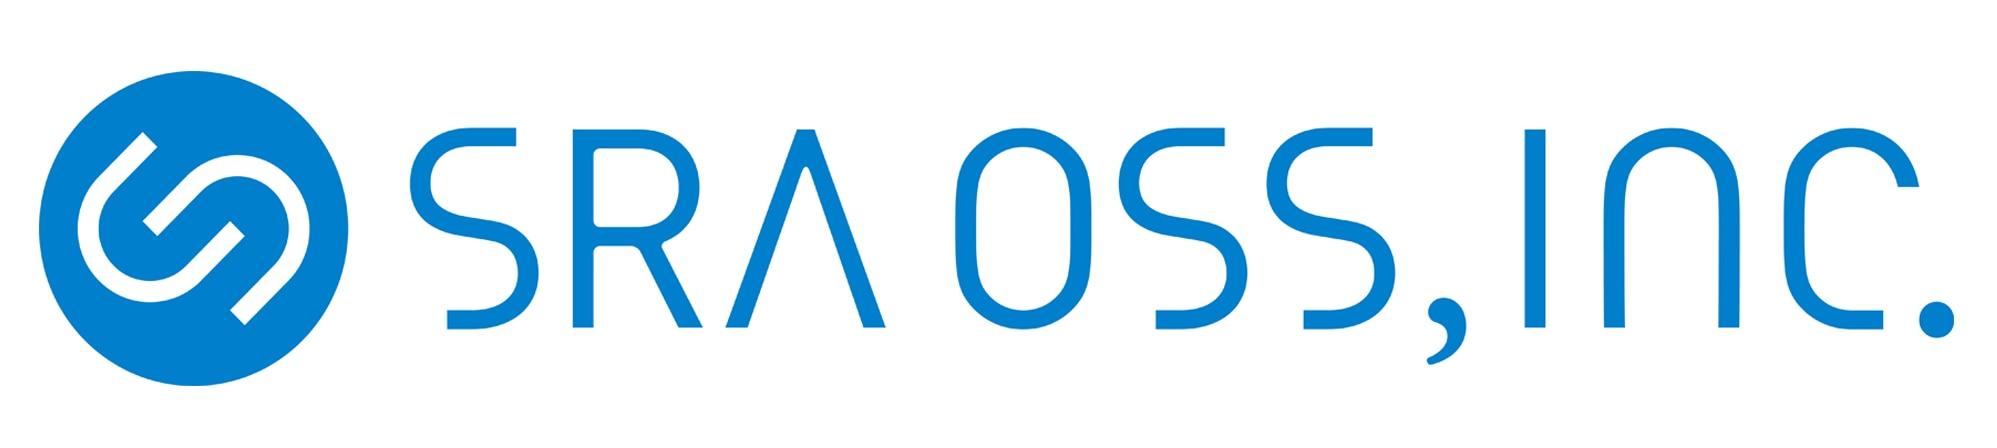 SRA OSS, Inc. 日本支社様